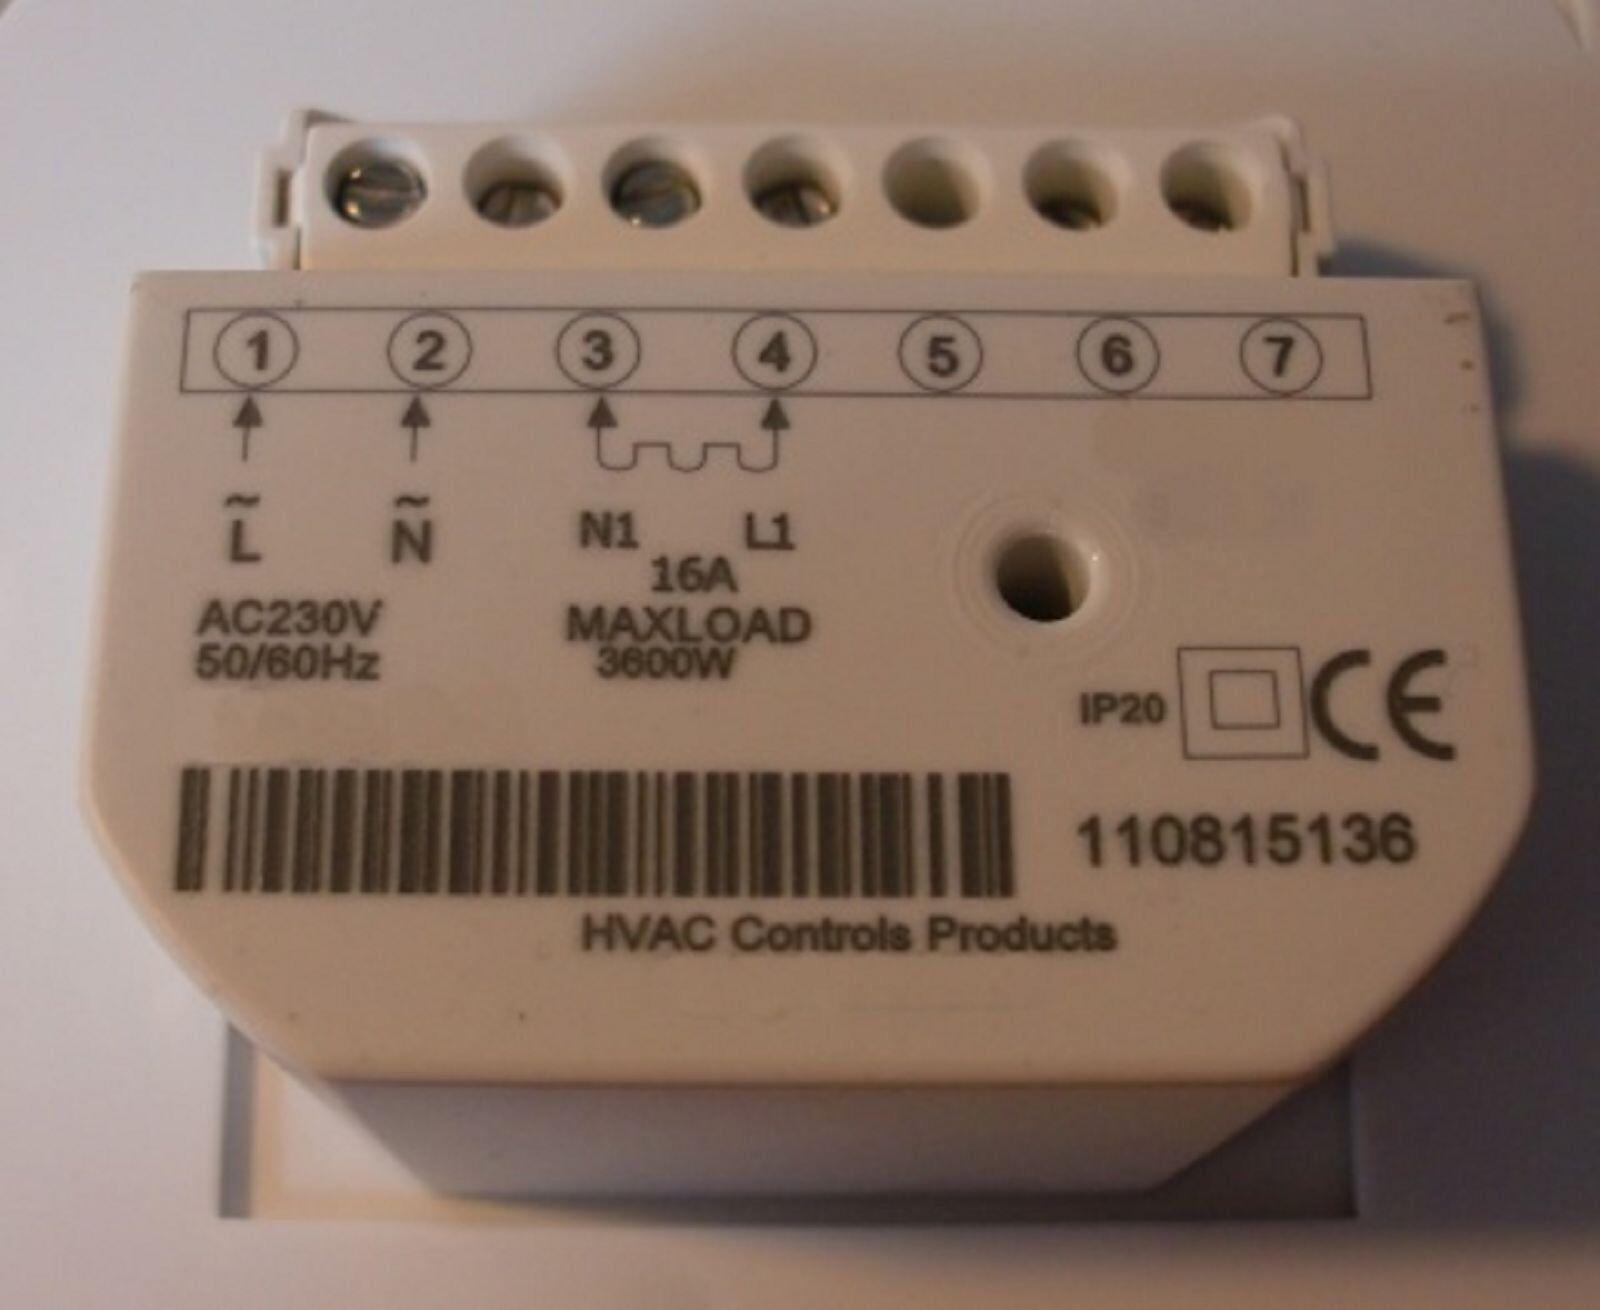 Thermostat hypocauste réservoir Blanc #830